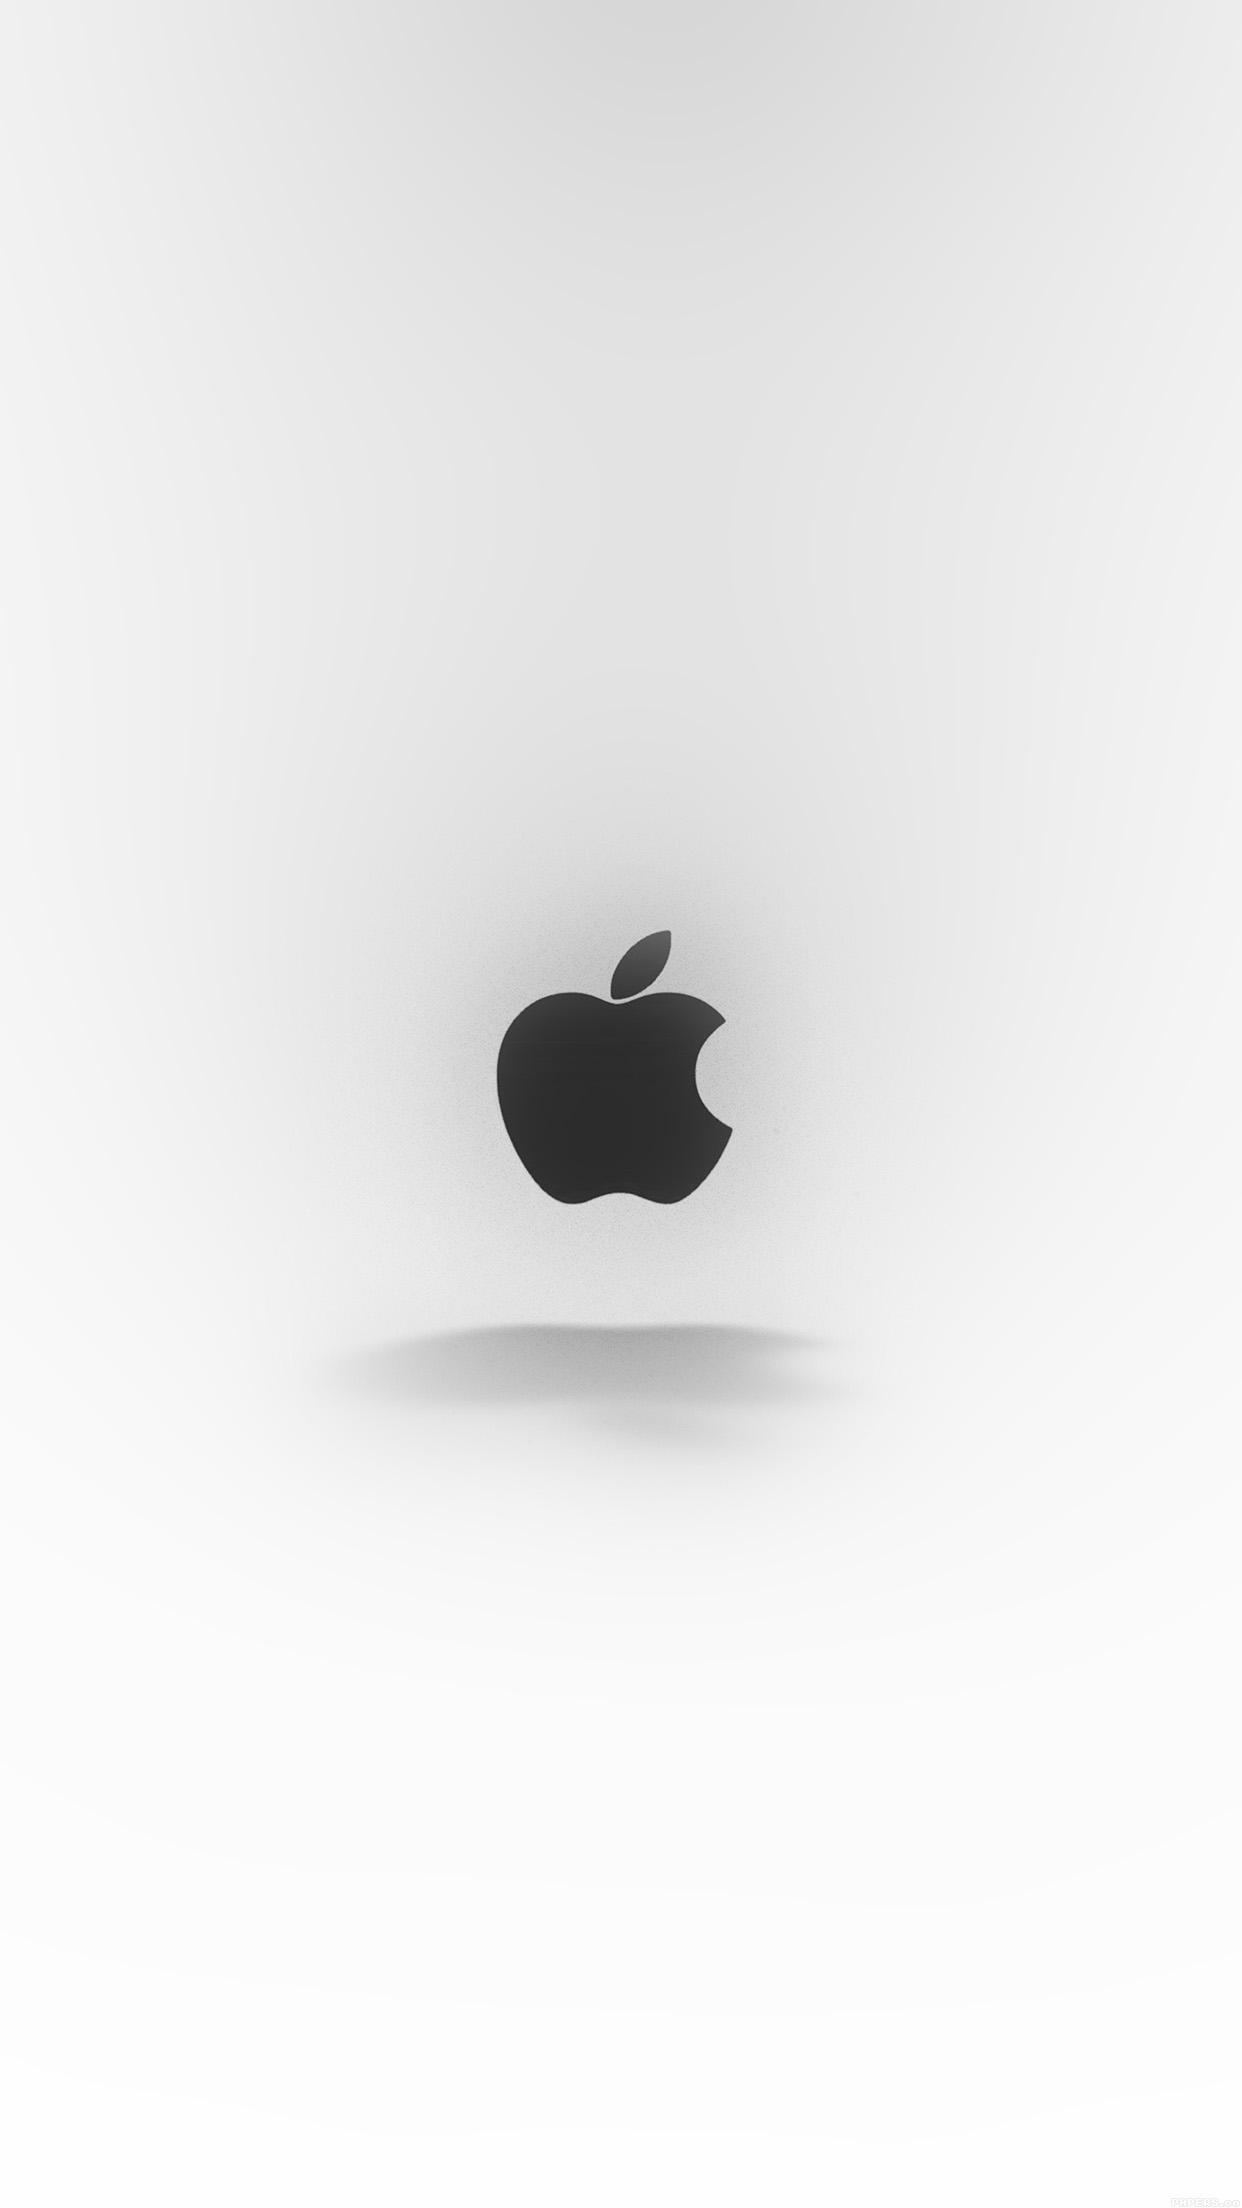 apple logo love mania white